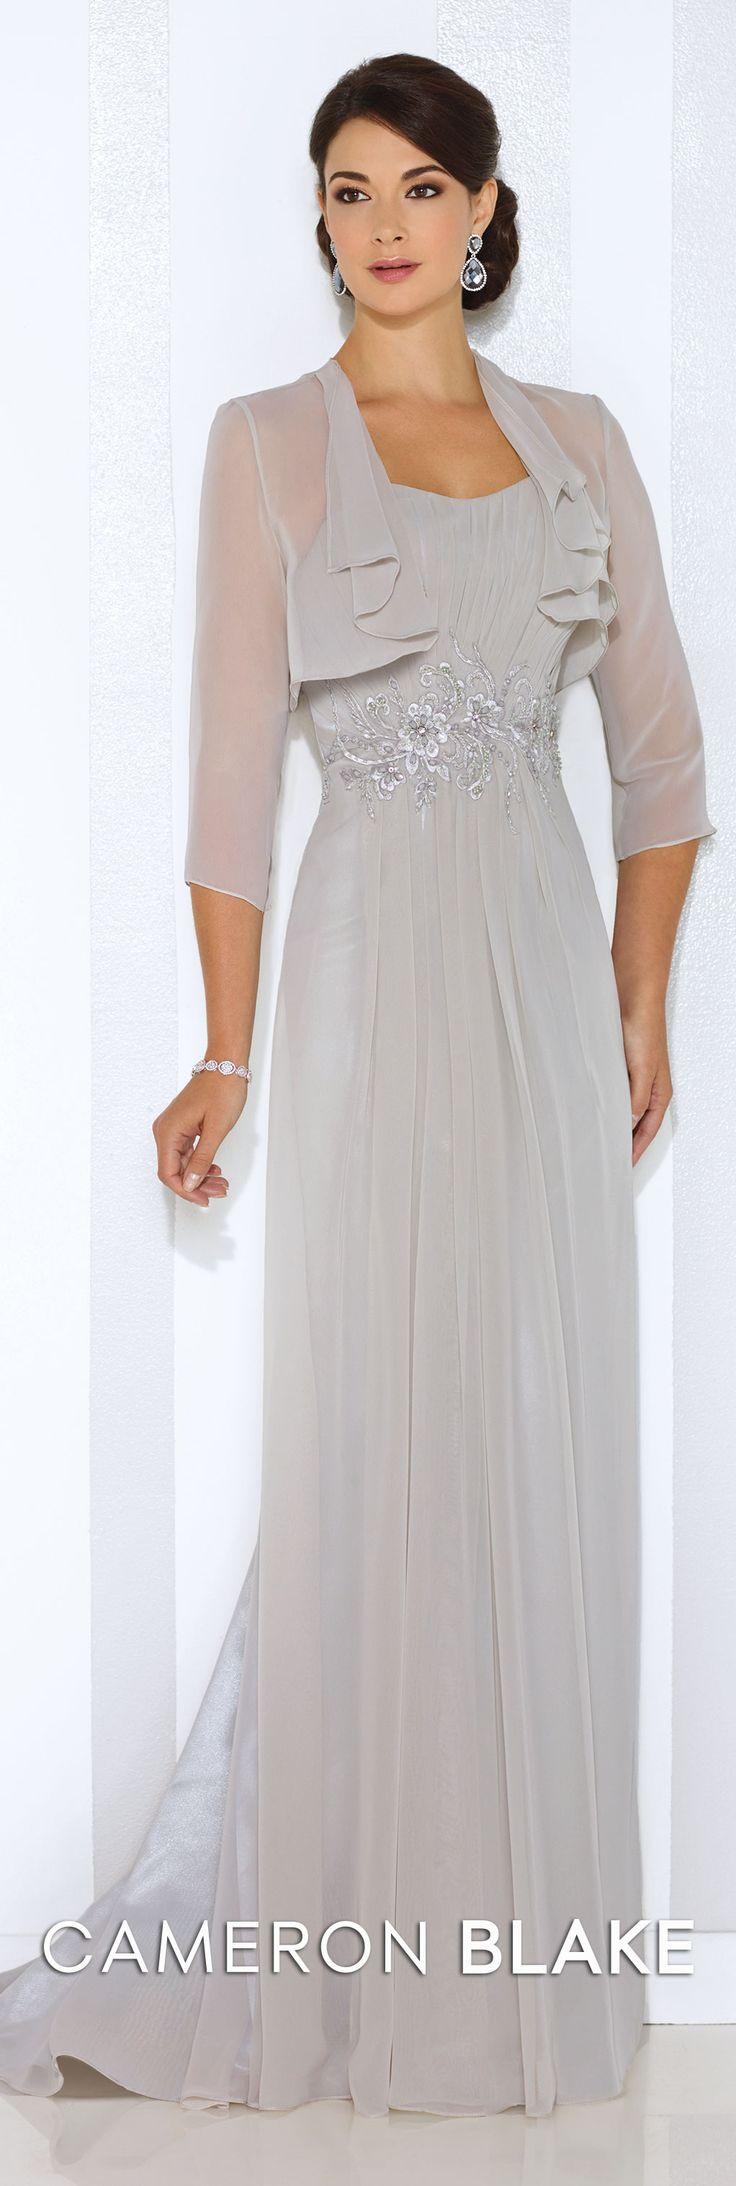 best wedding images on pinterest bridesmaids formal prom